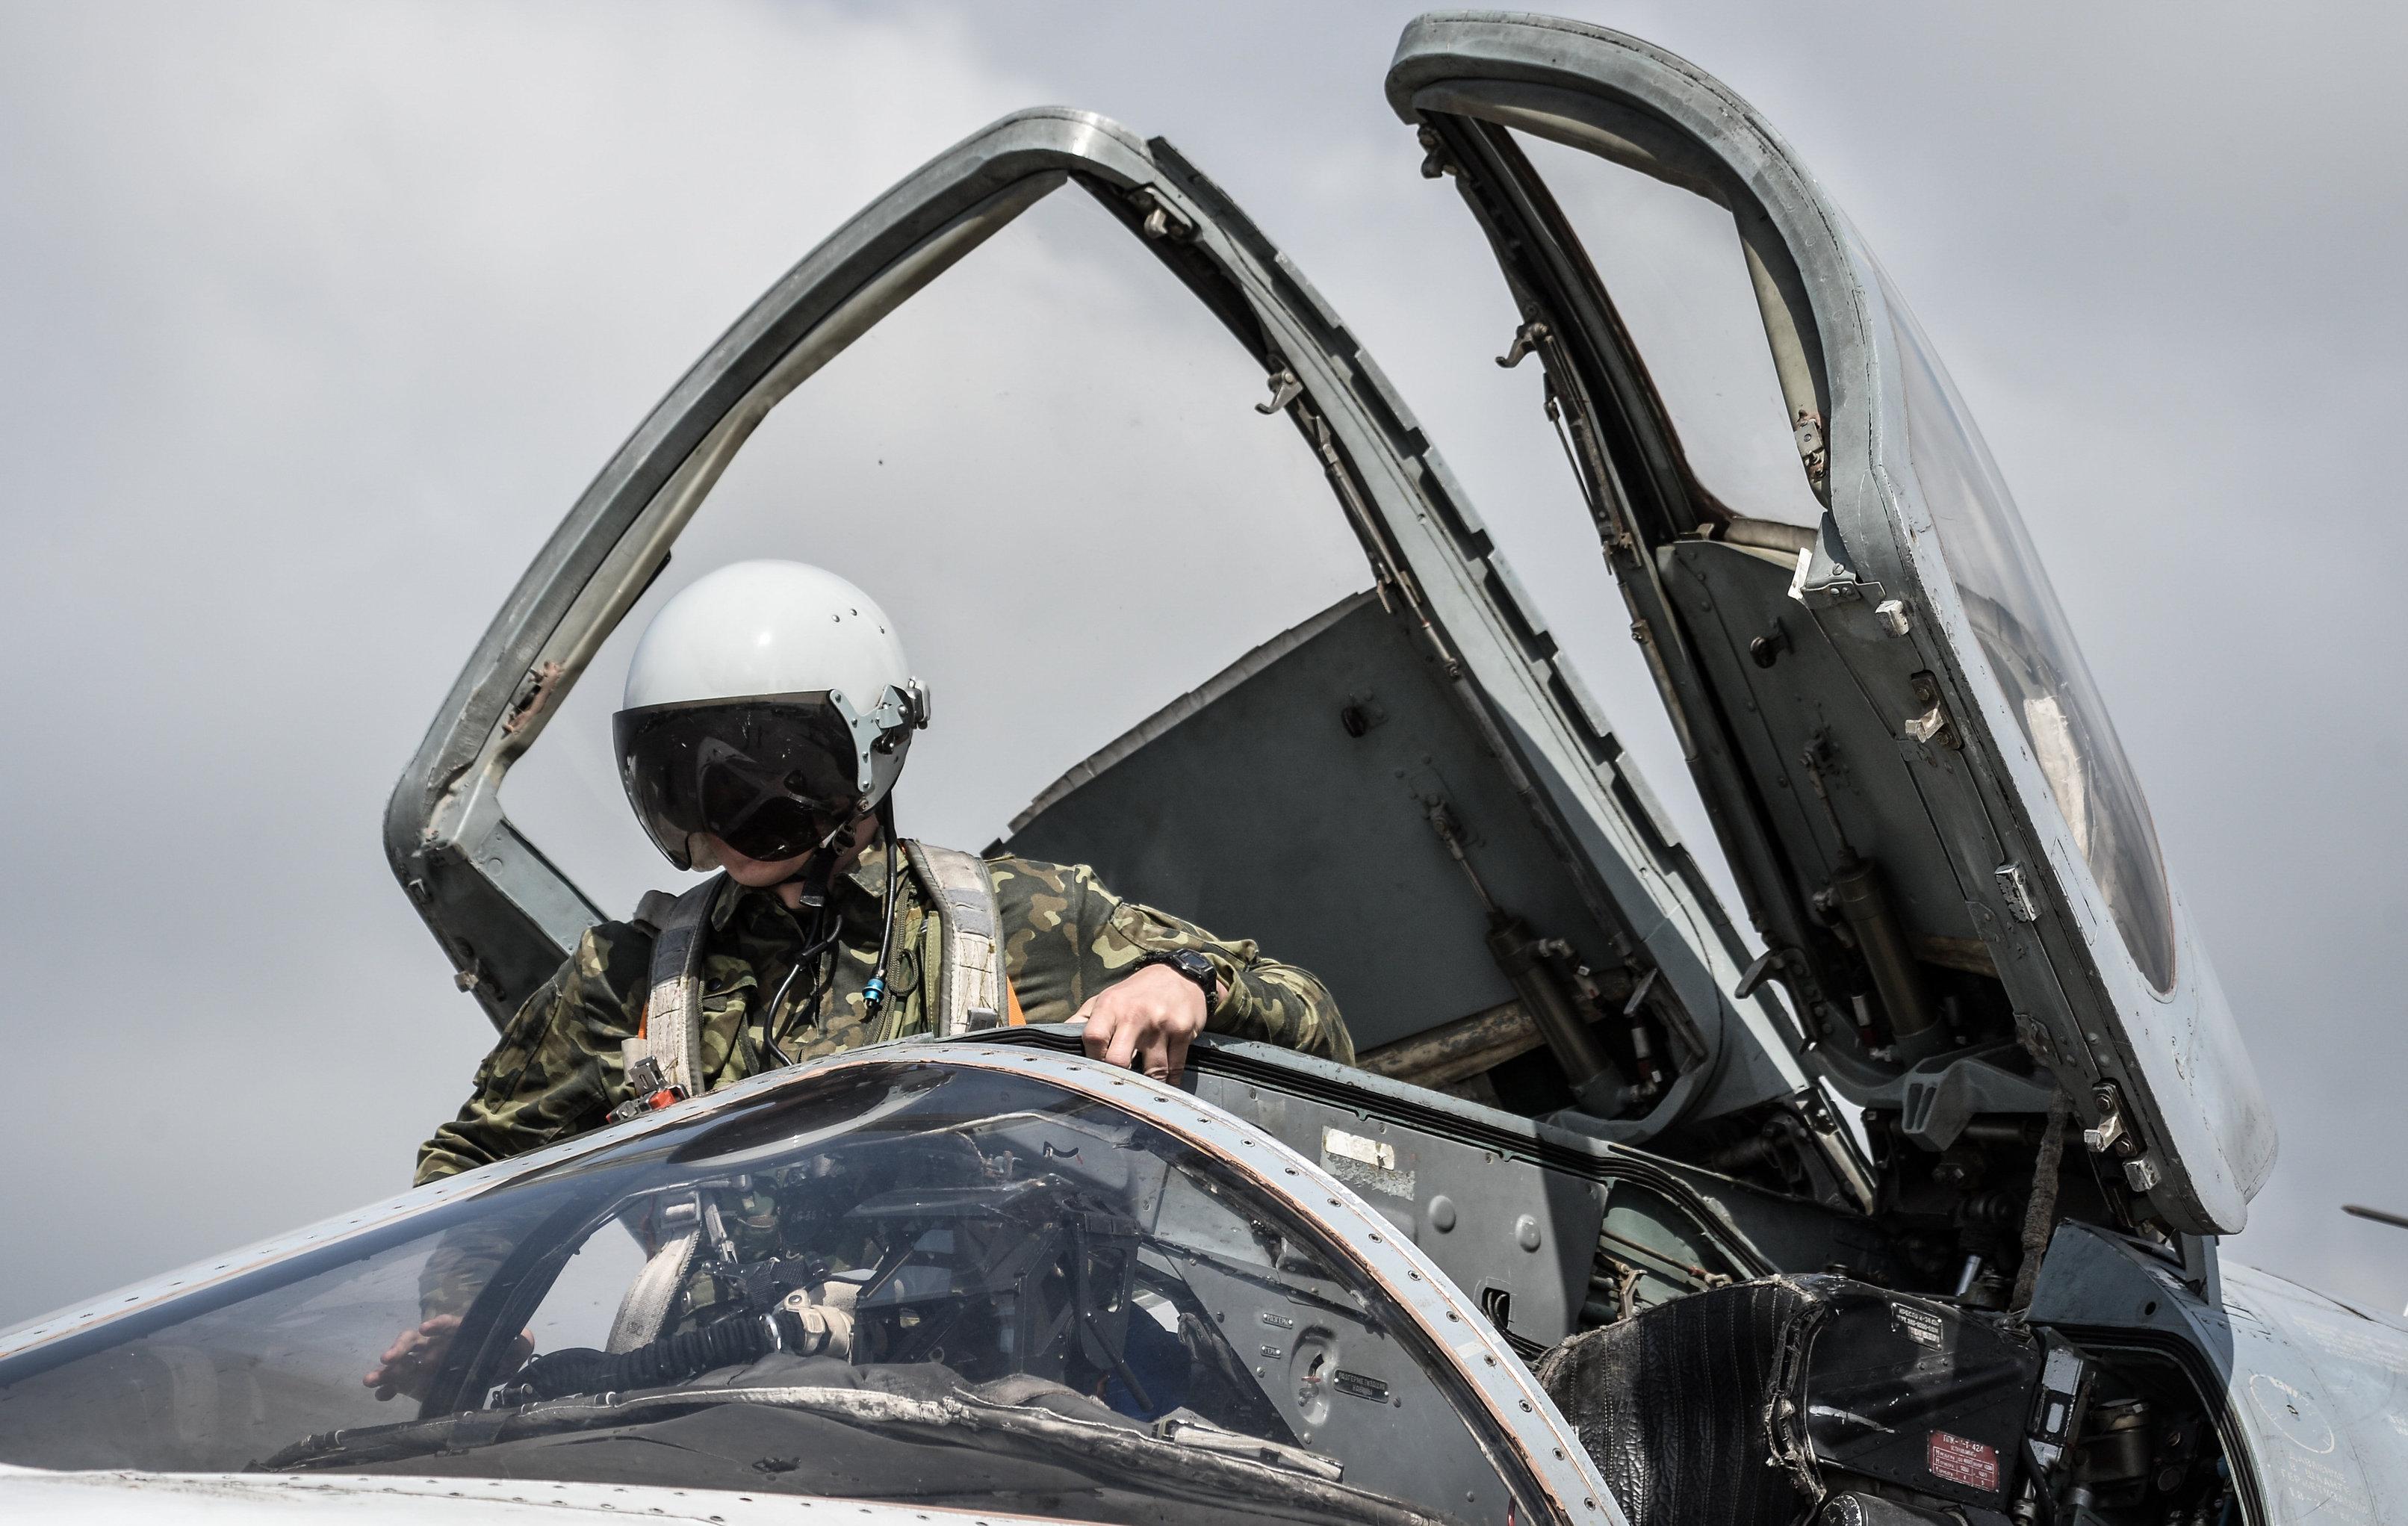 Hmeimim airbase in Syria